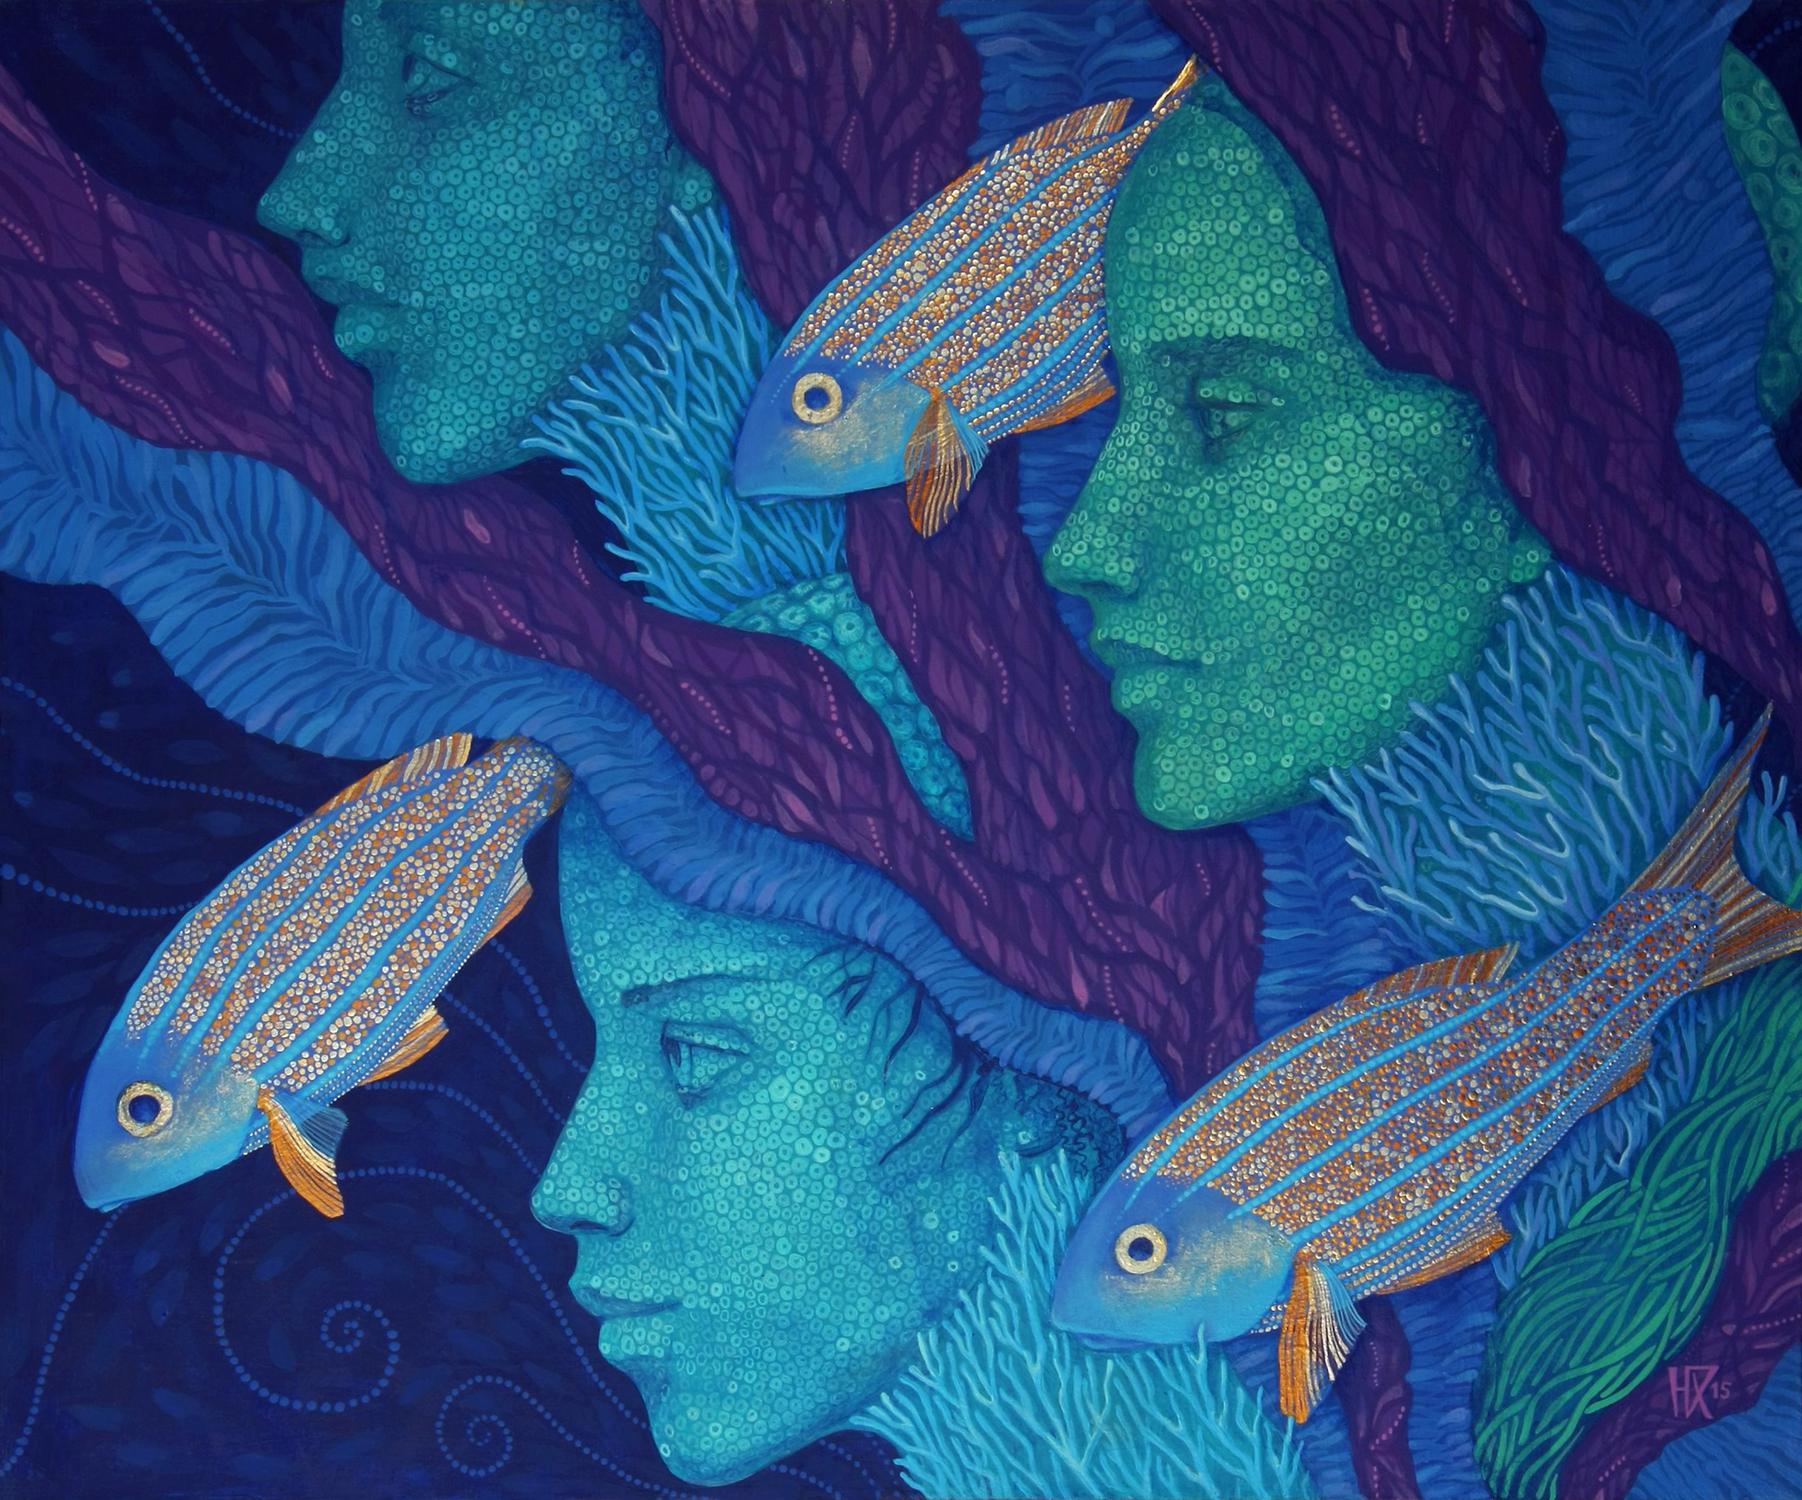 The Waiting Artwork by Julia Khoroshikh